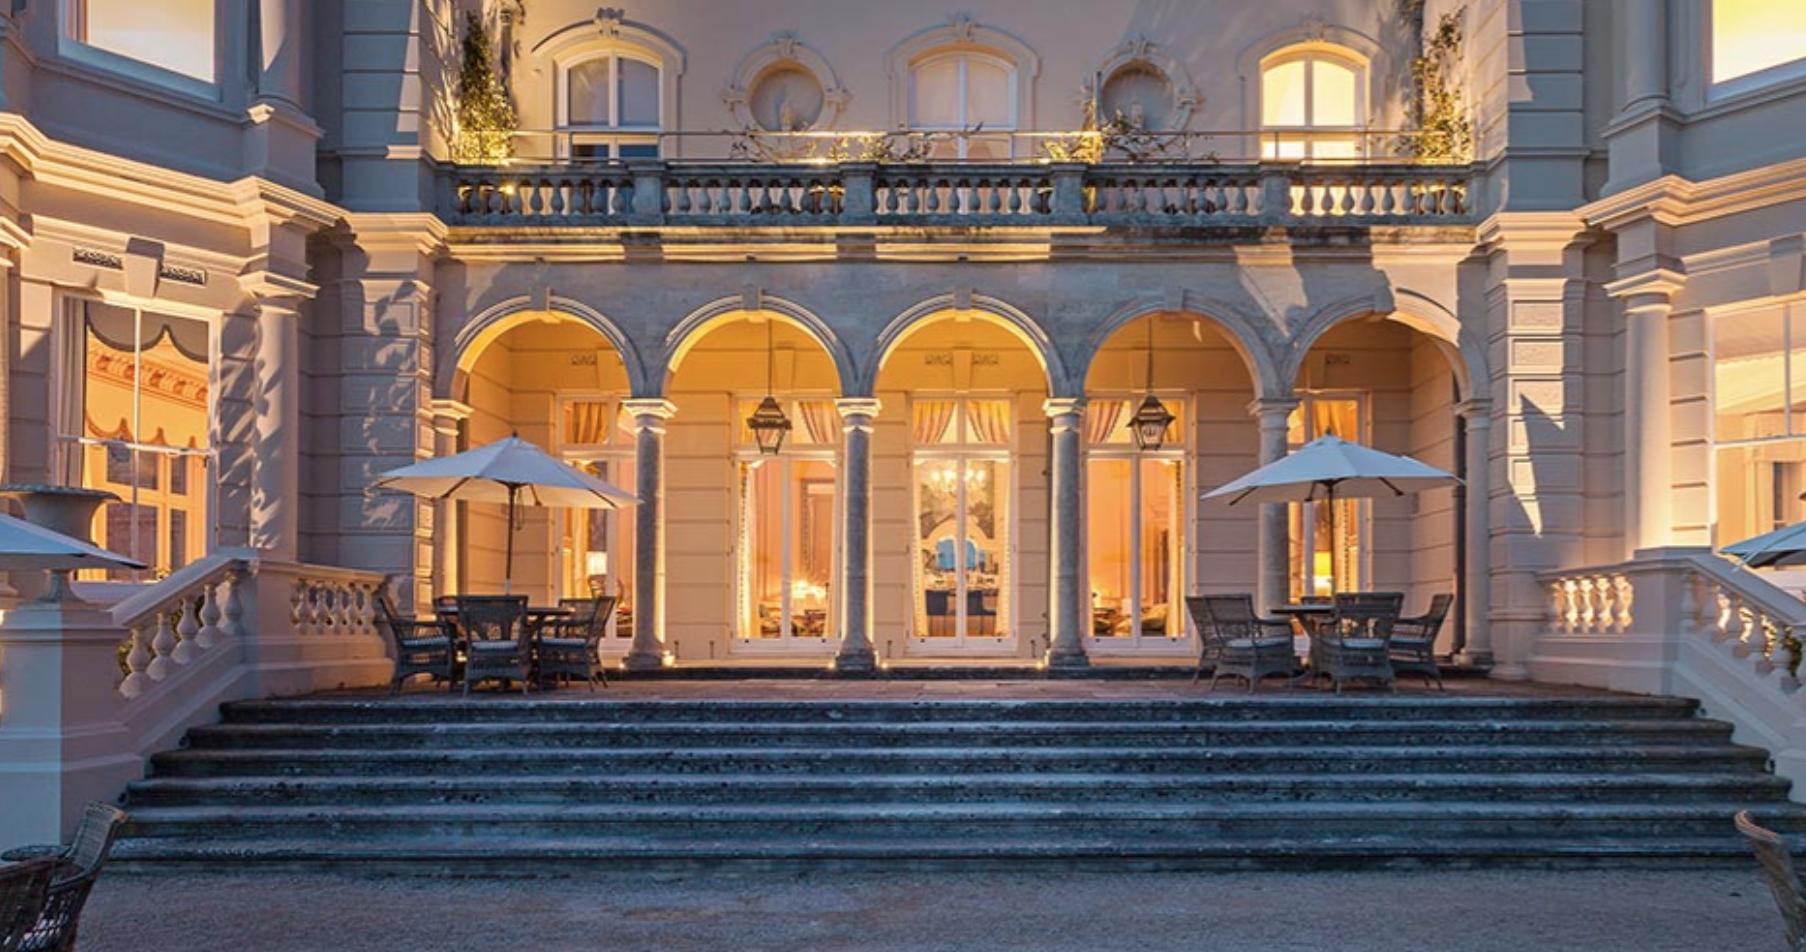 Beaverbrook & Cadogan To Open Luxury Hotel In Chelsea